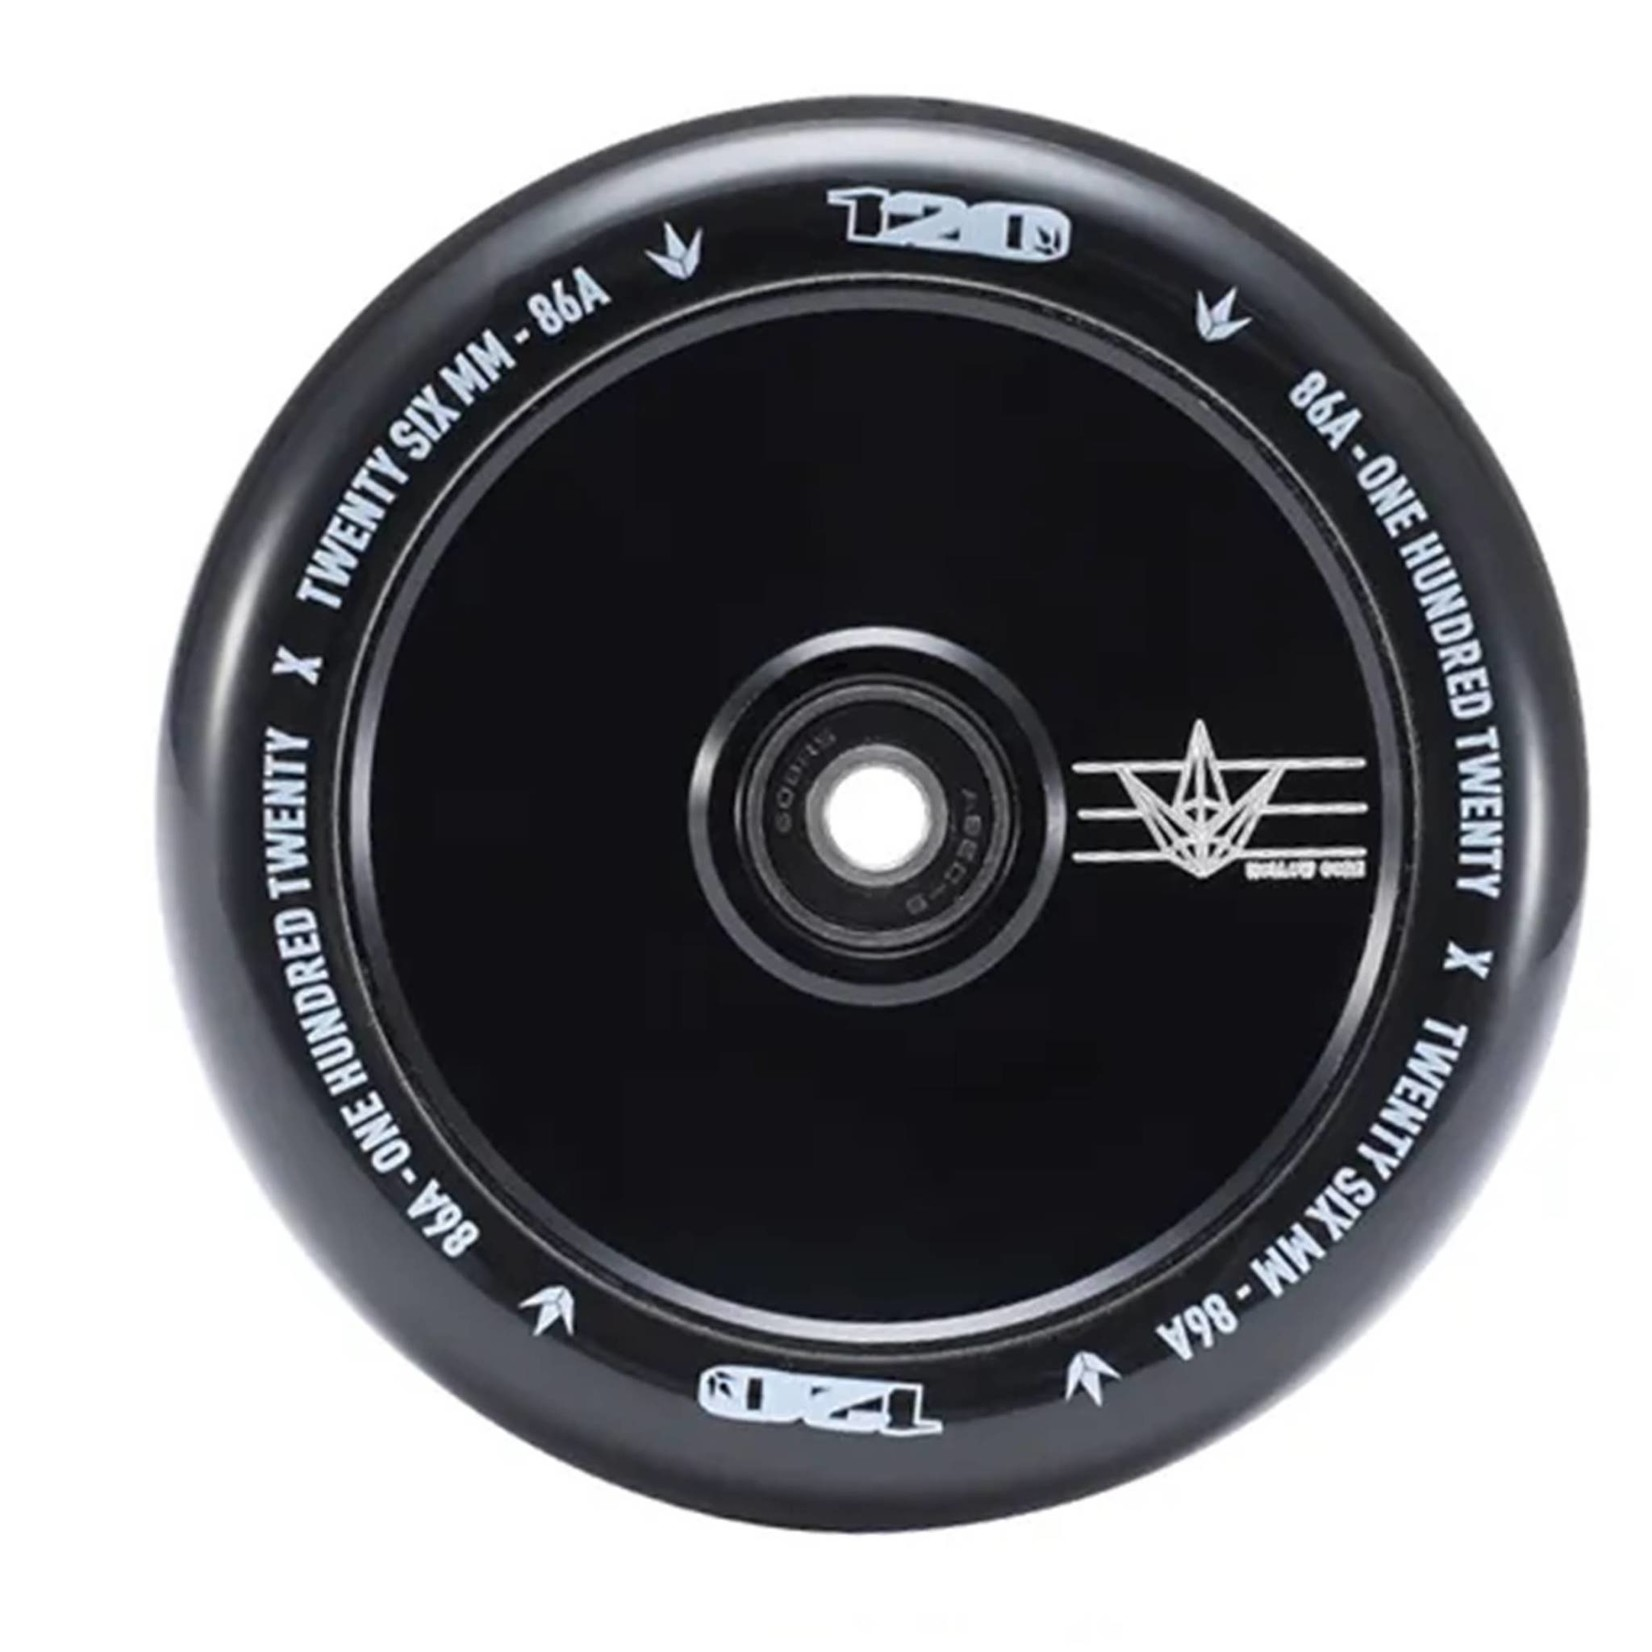 ENVY Envy Hollow Core Scooter Wheel 120mm Black